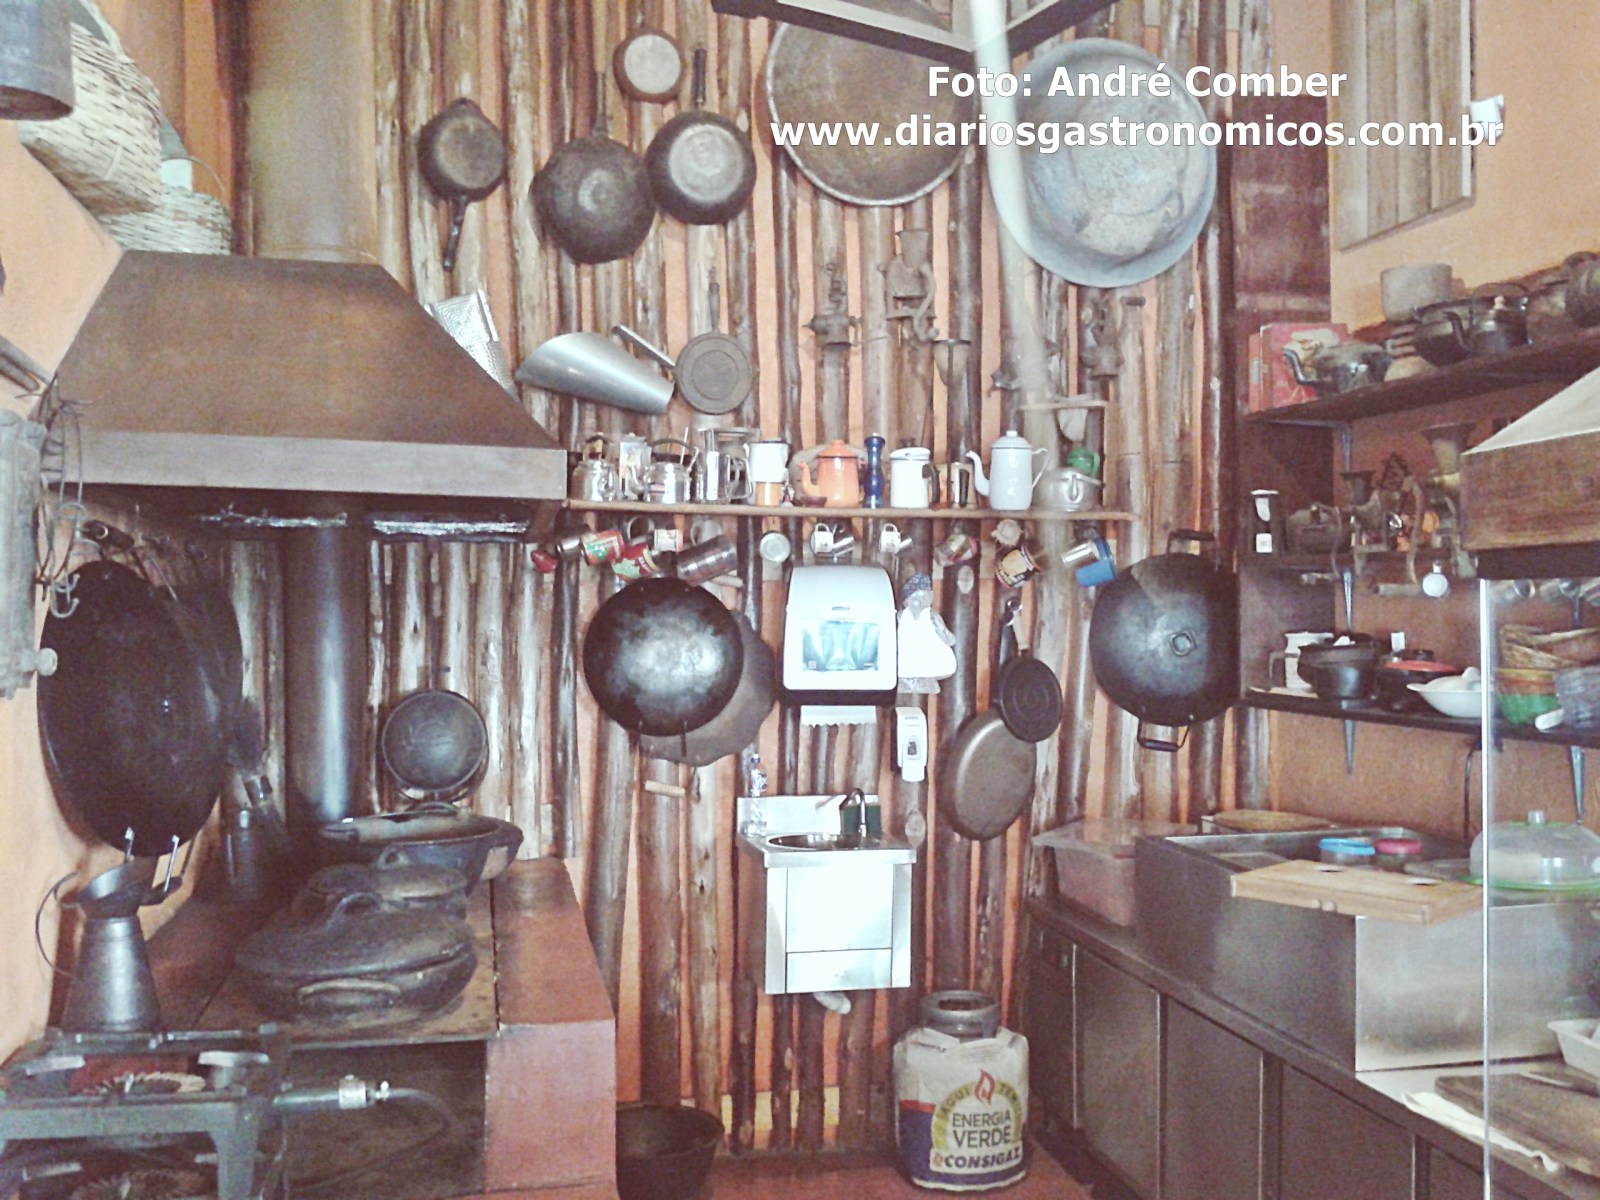 Arimba restaurante, Perdizes